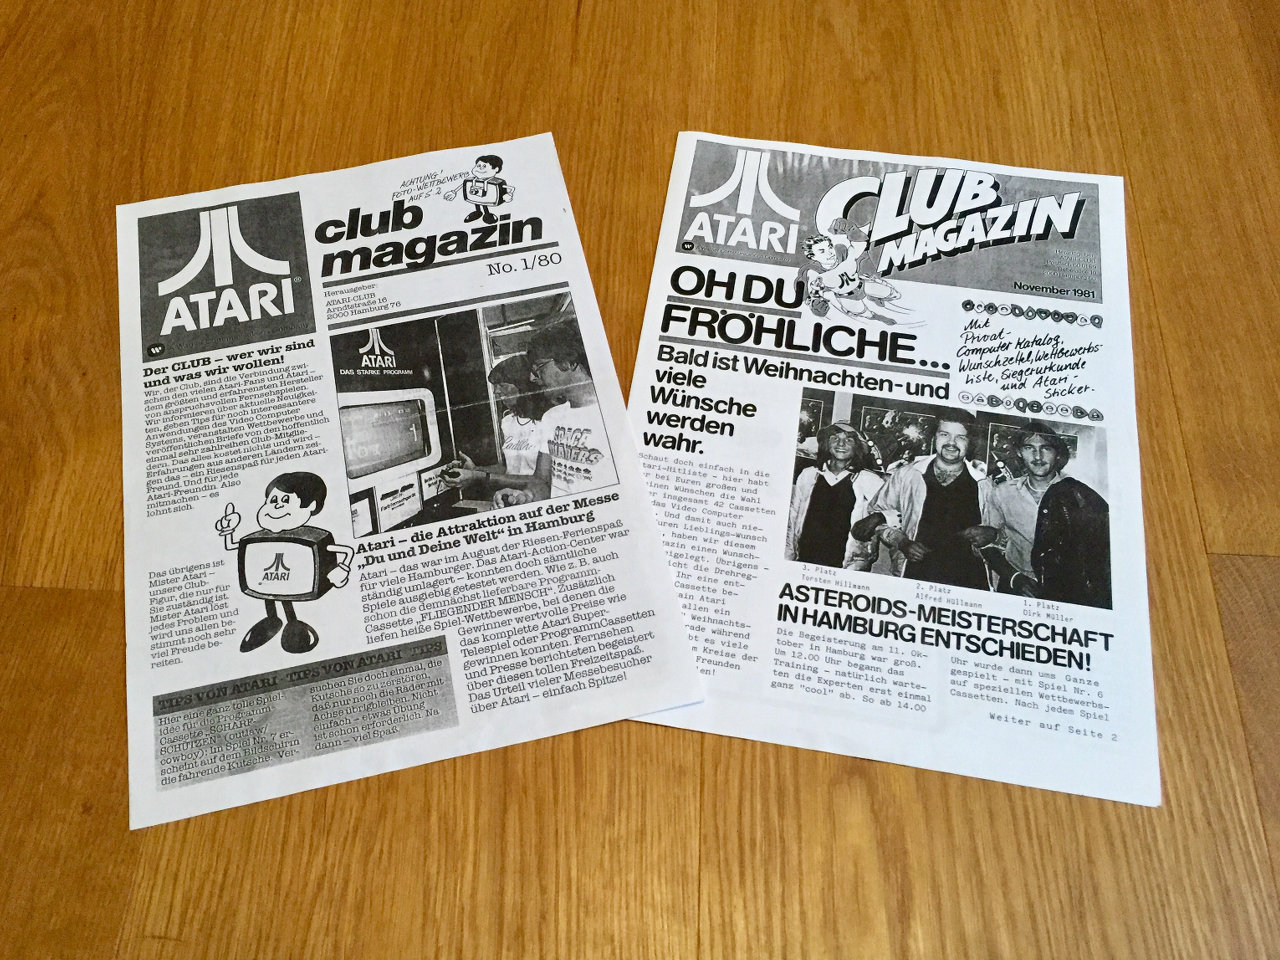 Das Atari Club Magazin erschien 1980. (Bild: André Eymann)